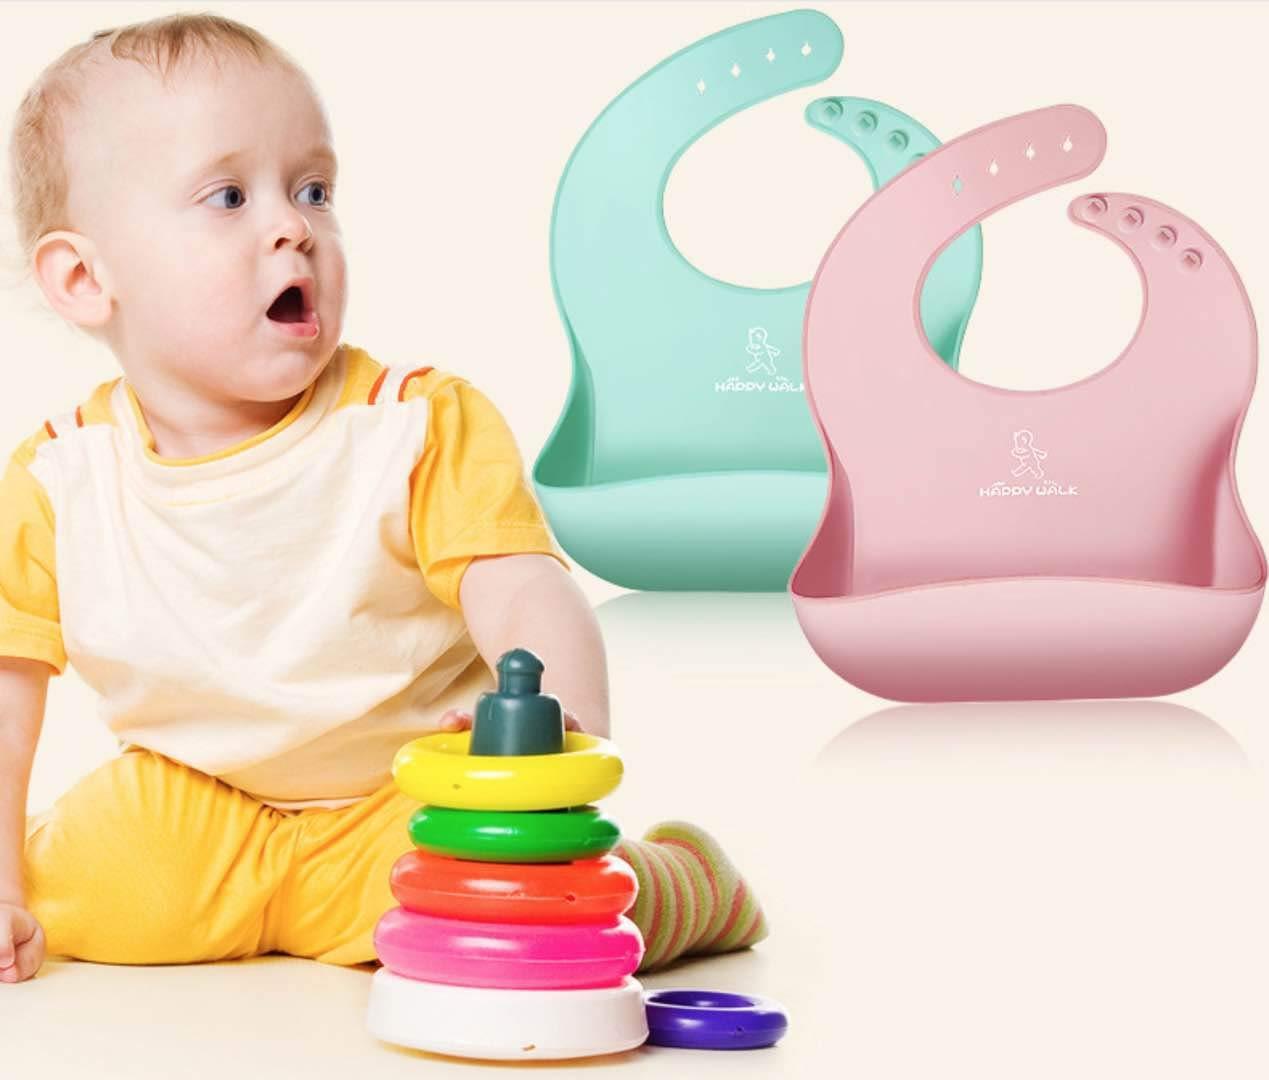 Uarashi Babero impermeable para bebés Conjunto de silicona suave de 2 bebés/Niños/Niñito/Baberos de niños Bacterias resistentes fácilmente toallitas limpias ...